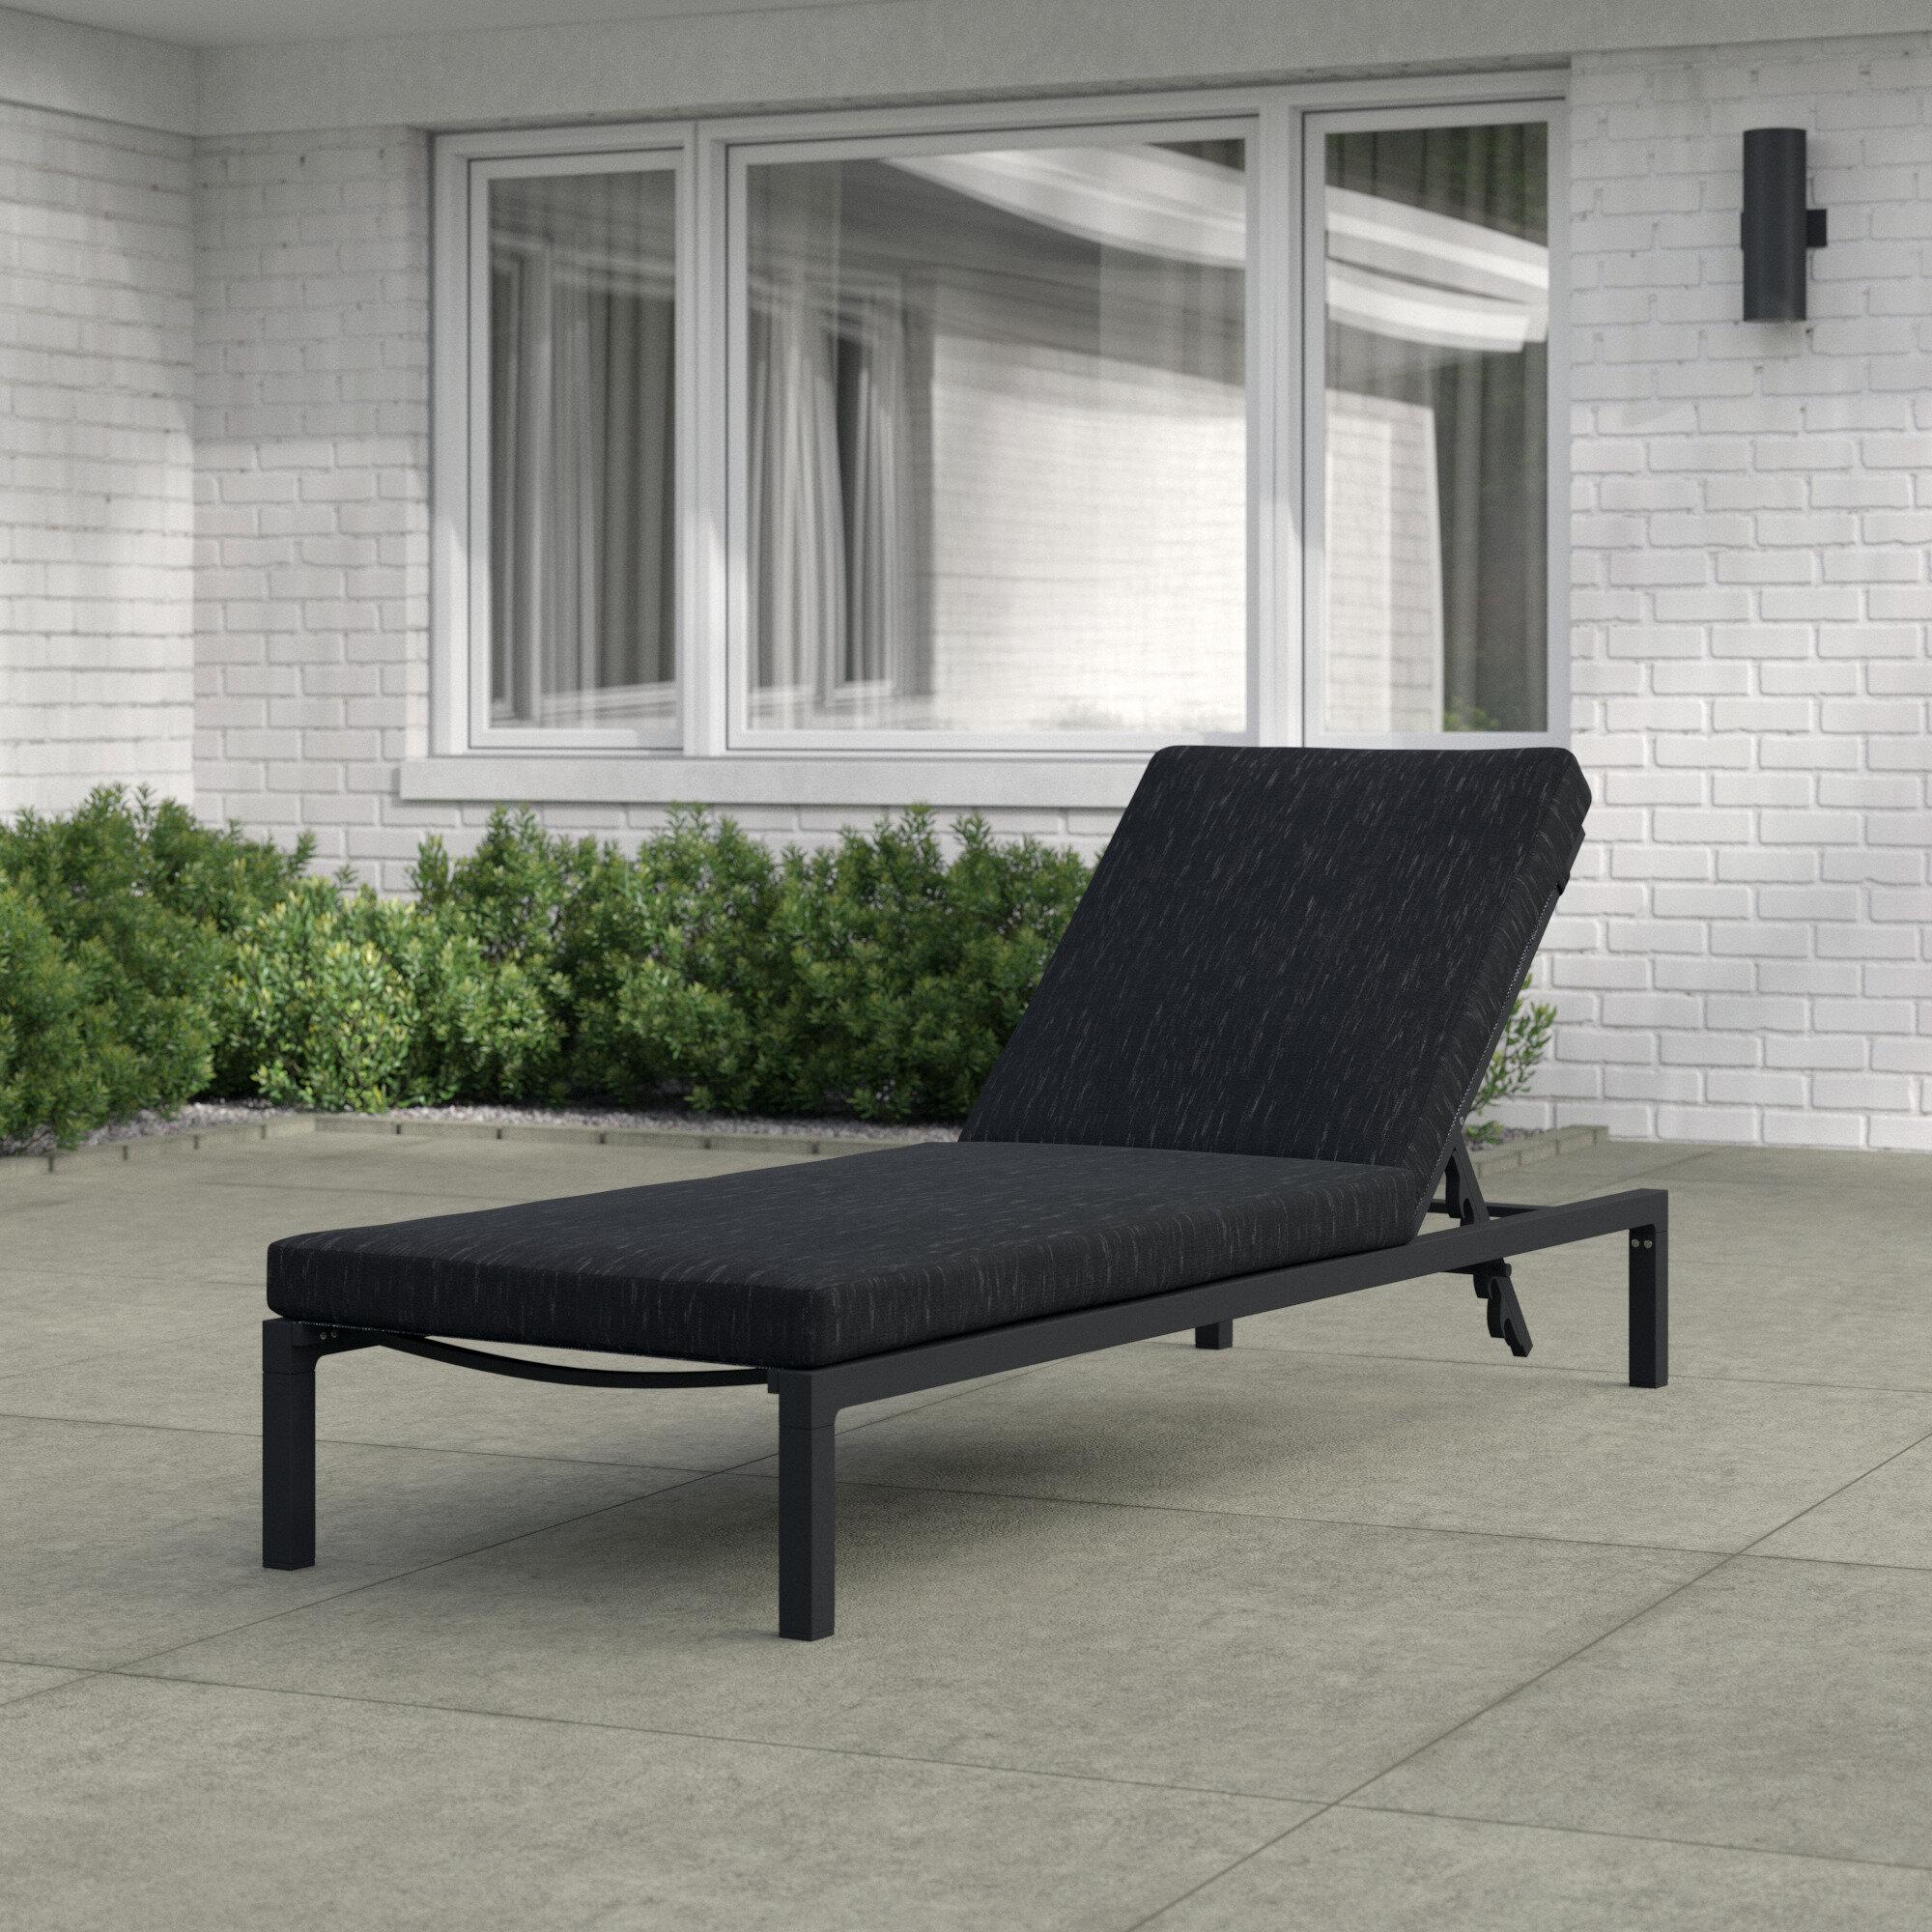 - Mirando Reclining Chaise Lounge With Cushion & Reviews Joss & Main